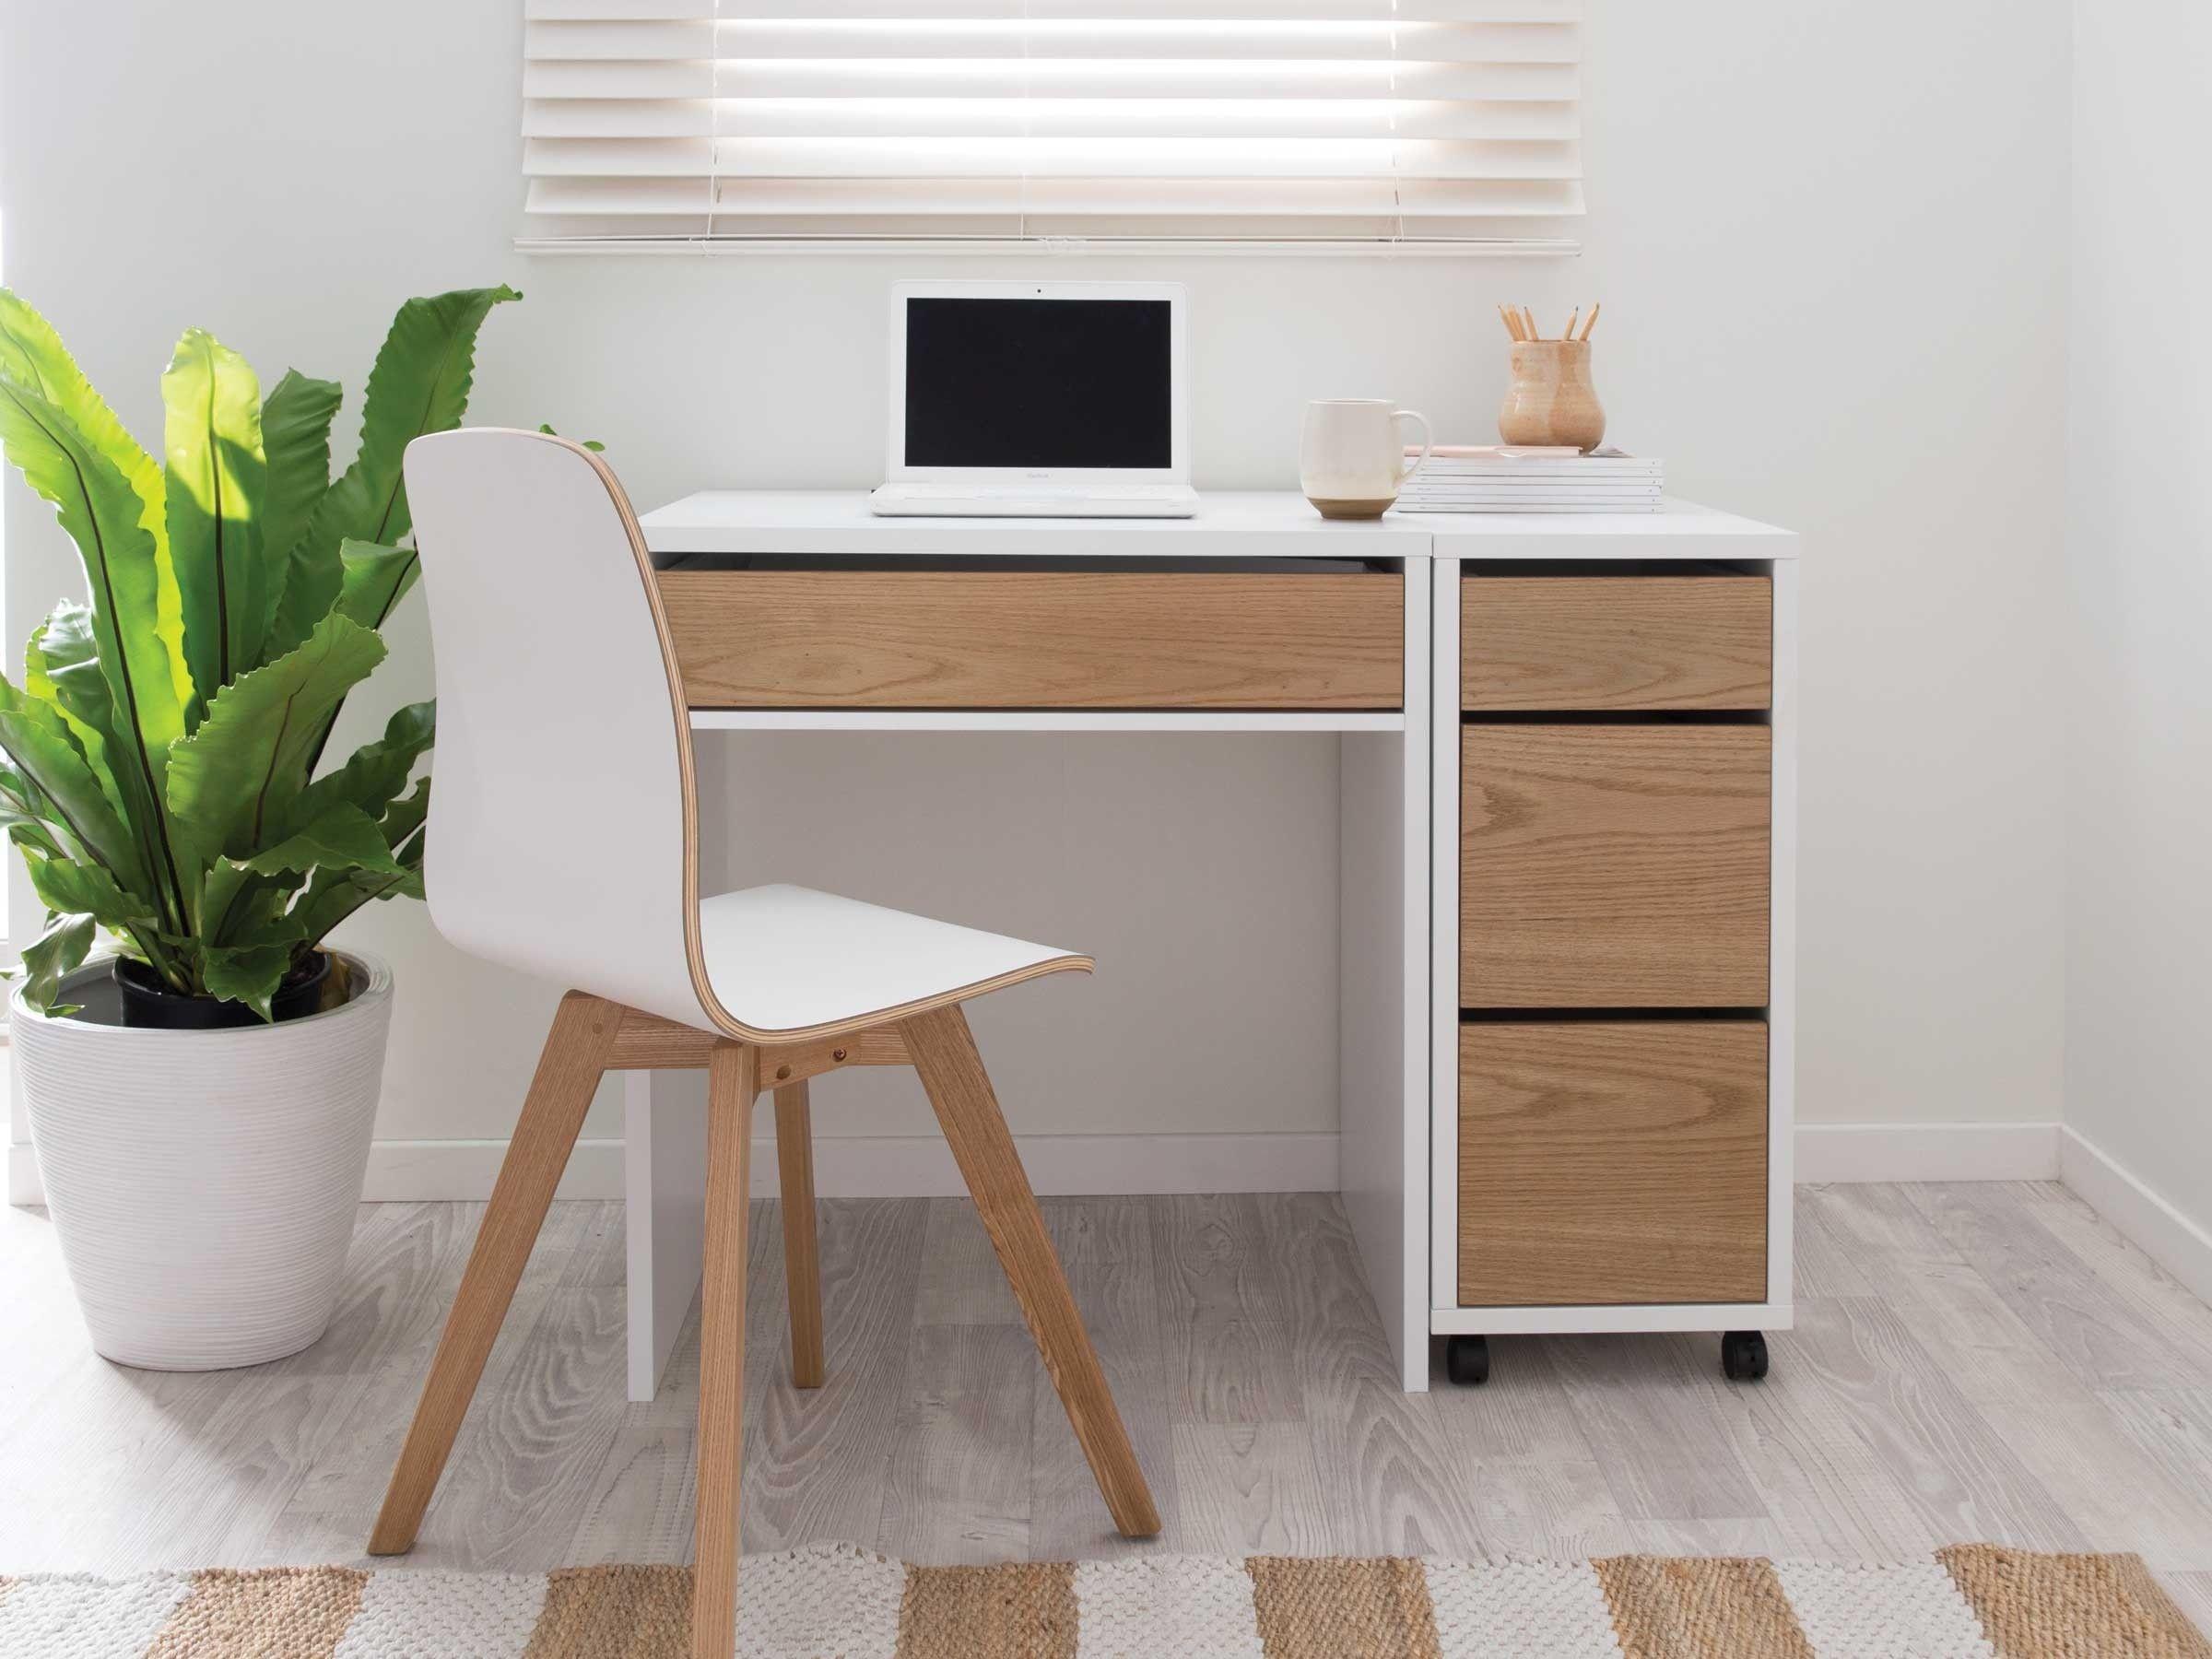 Small Bedroom Chairs Nz #bedroomideas in 43